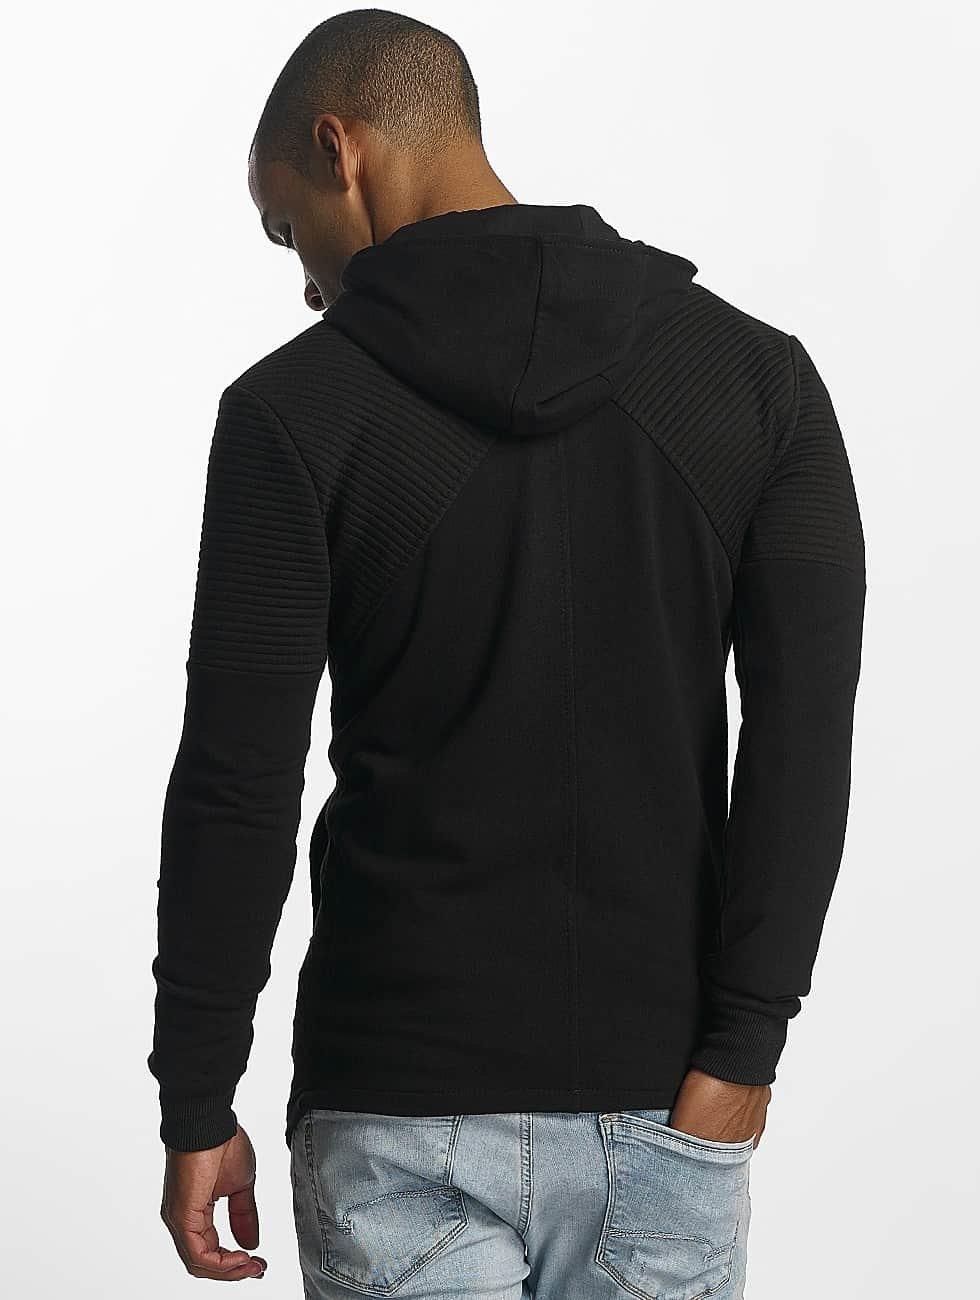 Uniplay Sudaderas con cremallera Zipper negro